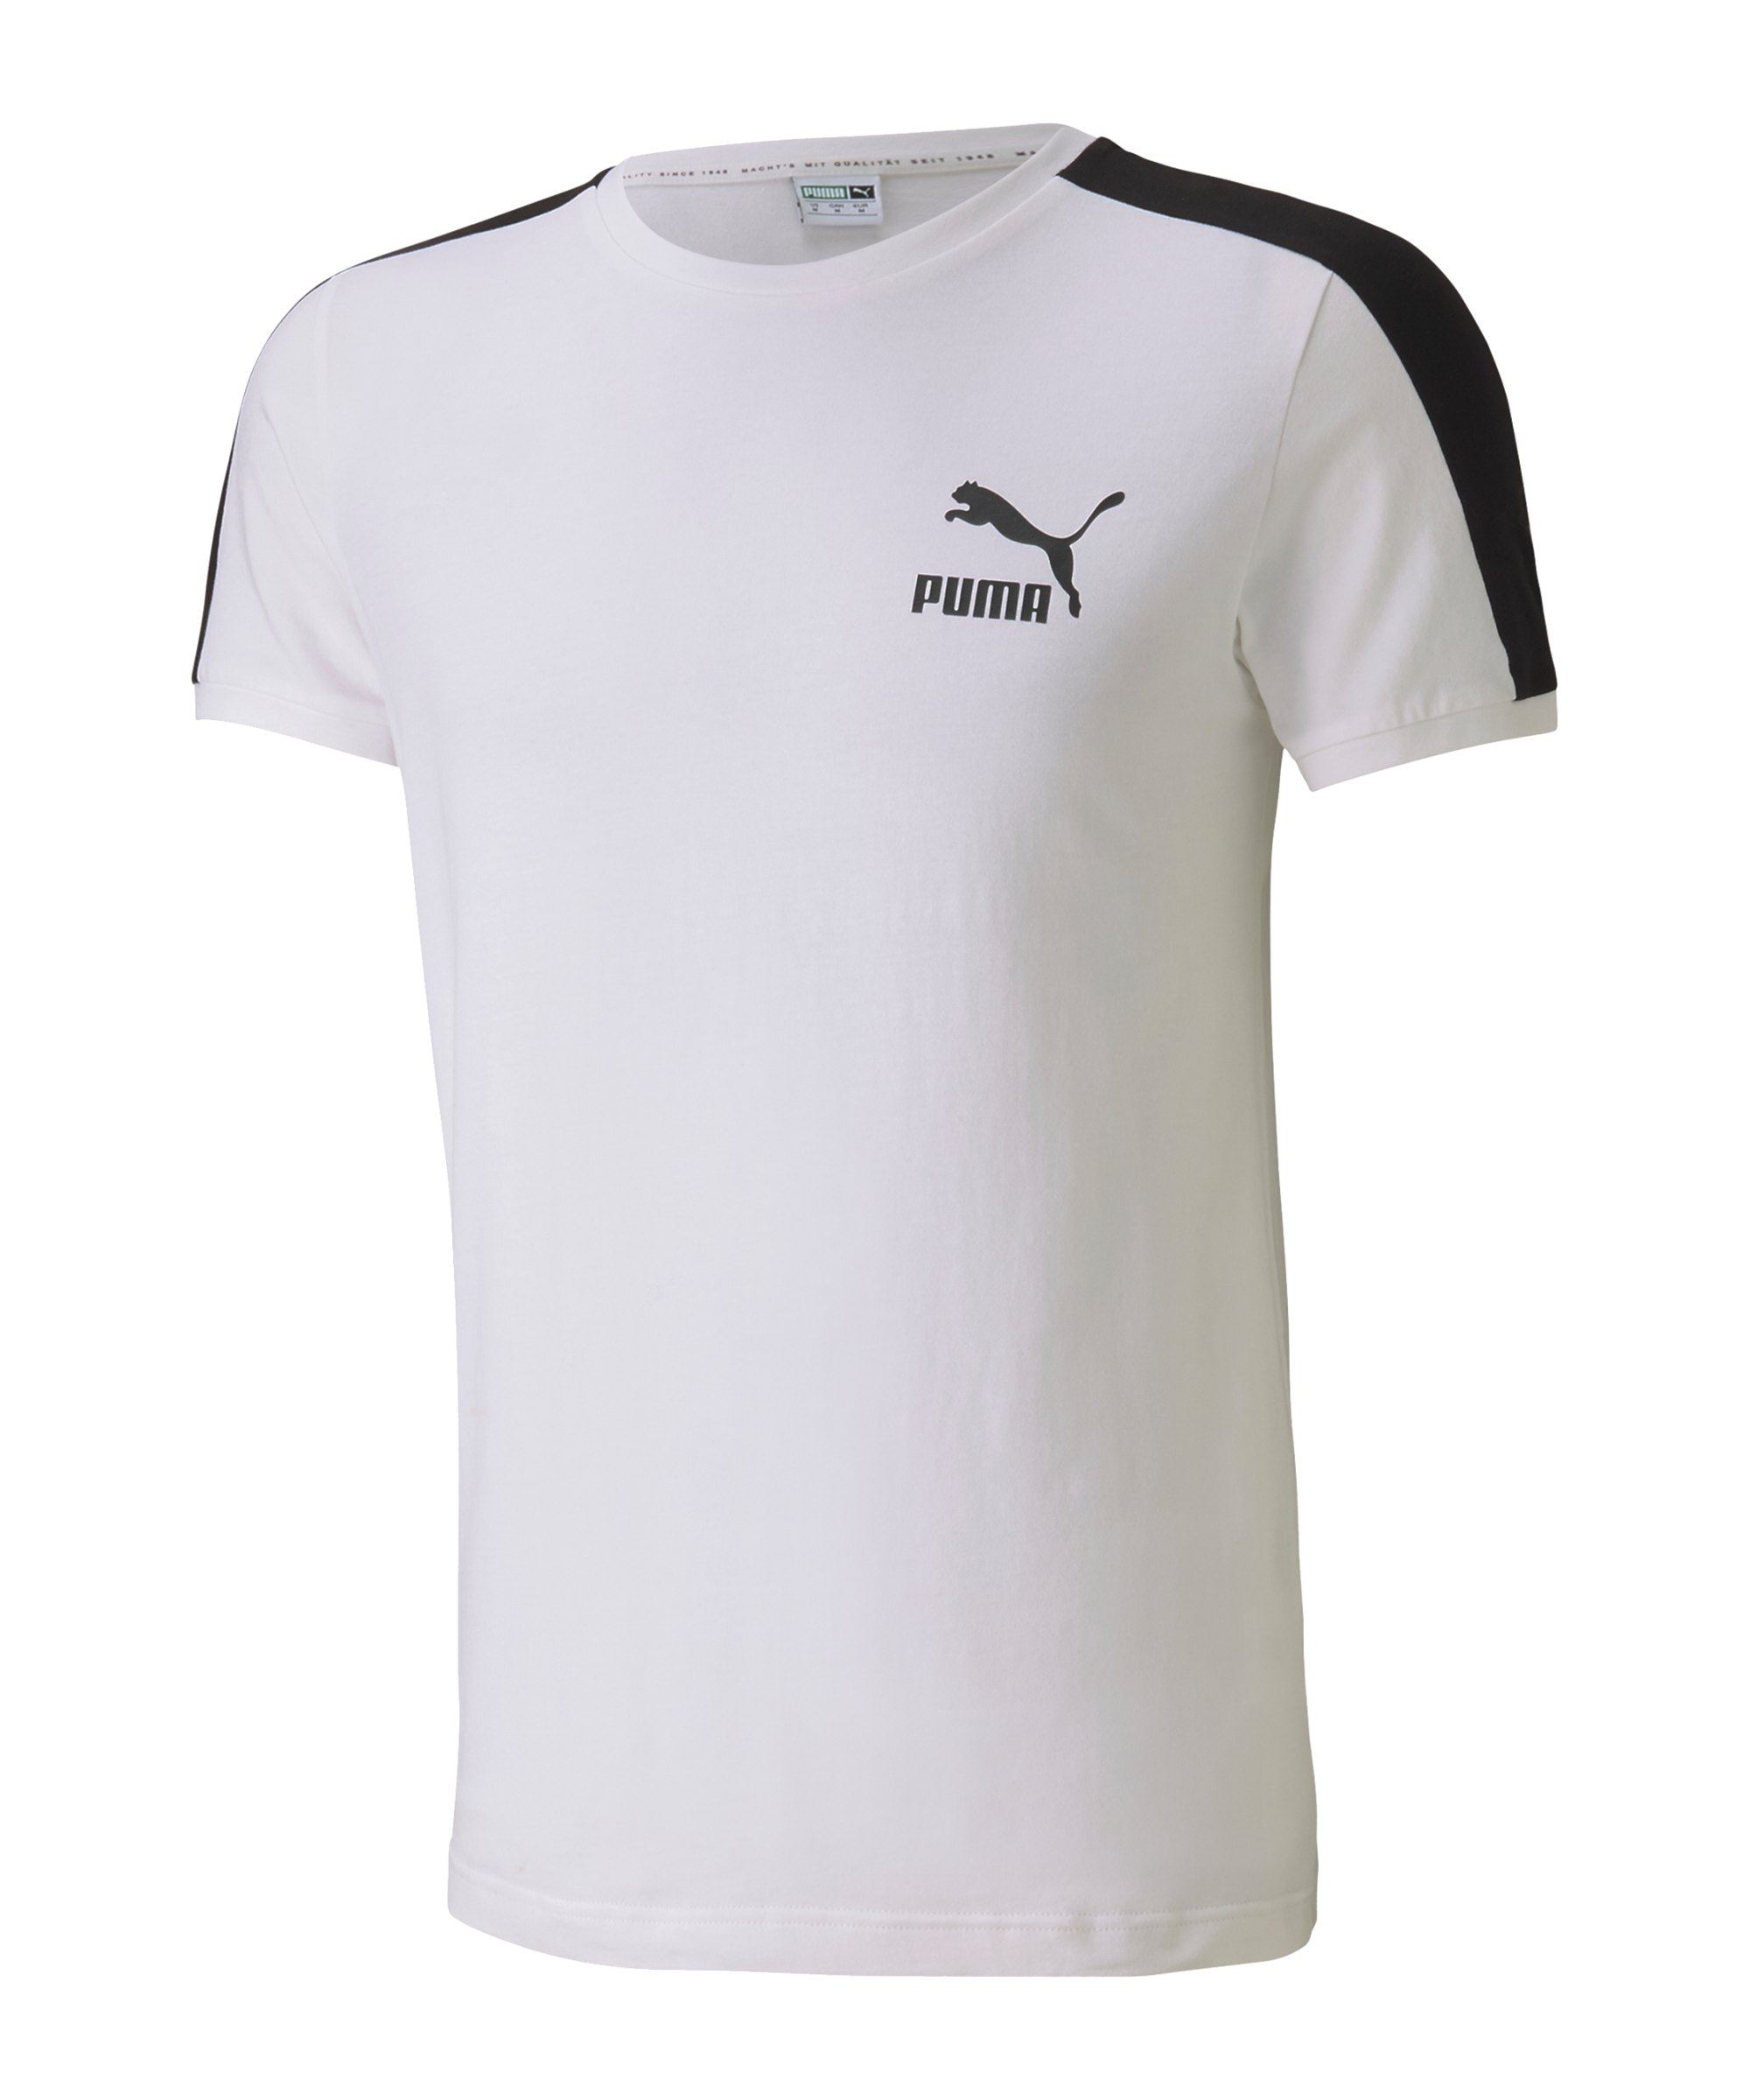 PUMA Iconic T7 Slim Tee T-Shirt Weiss F02 - weiss